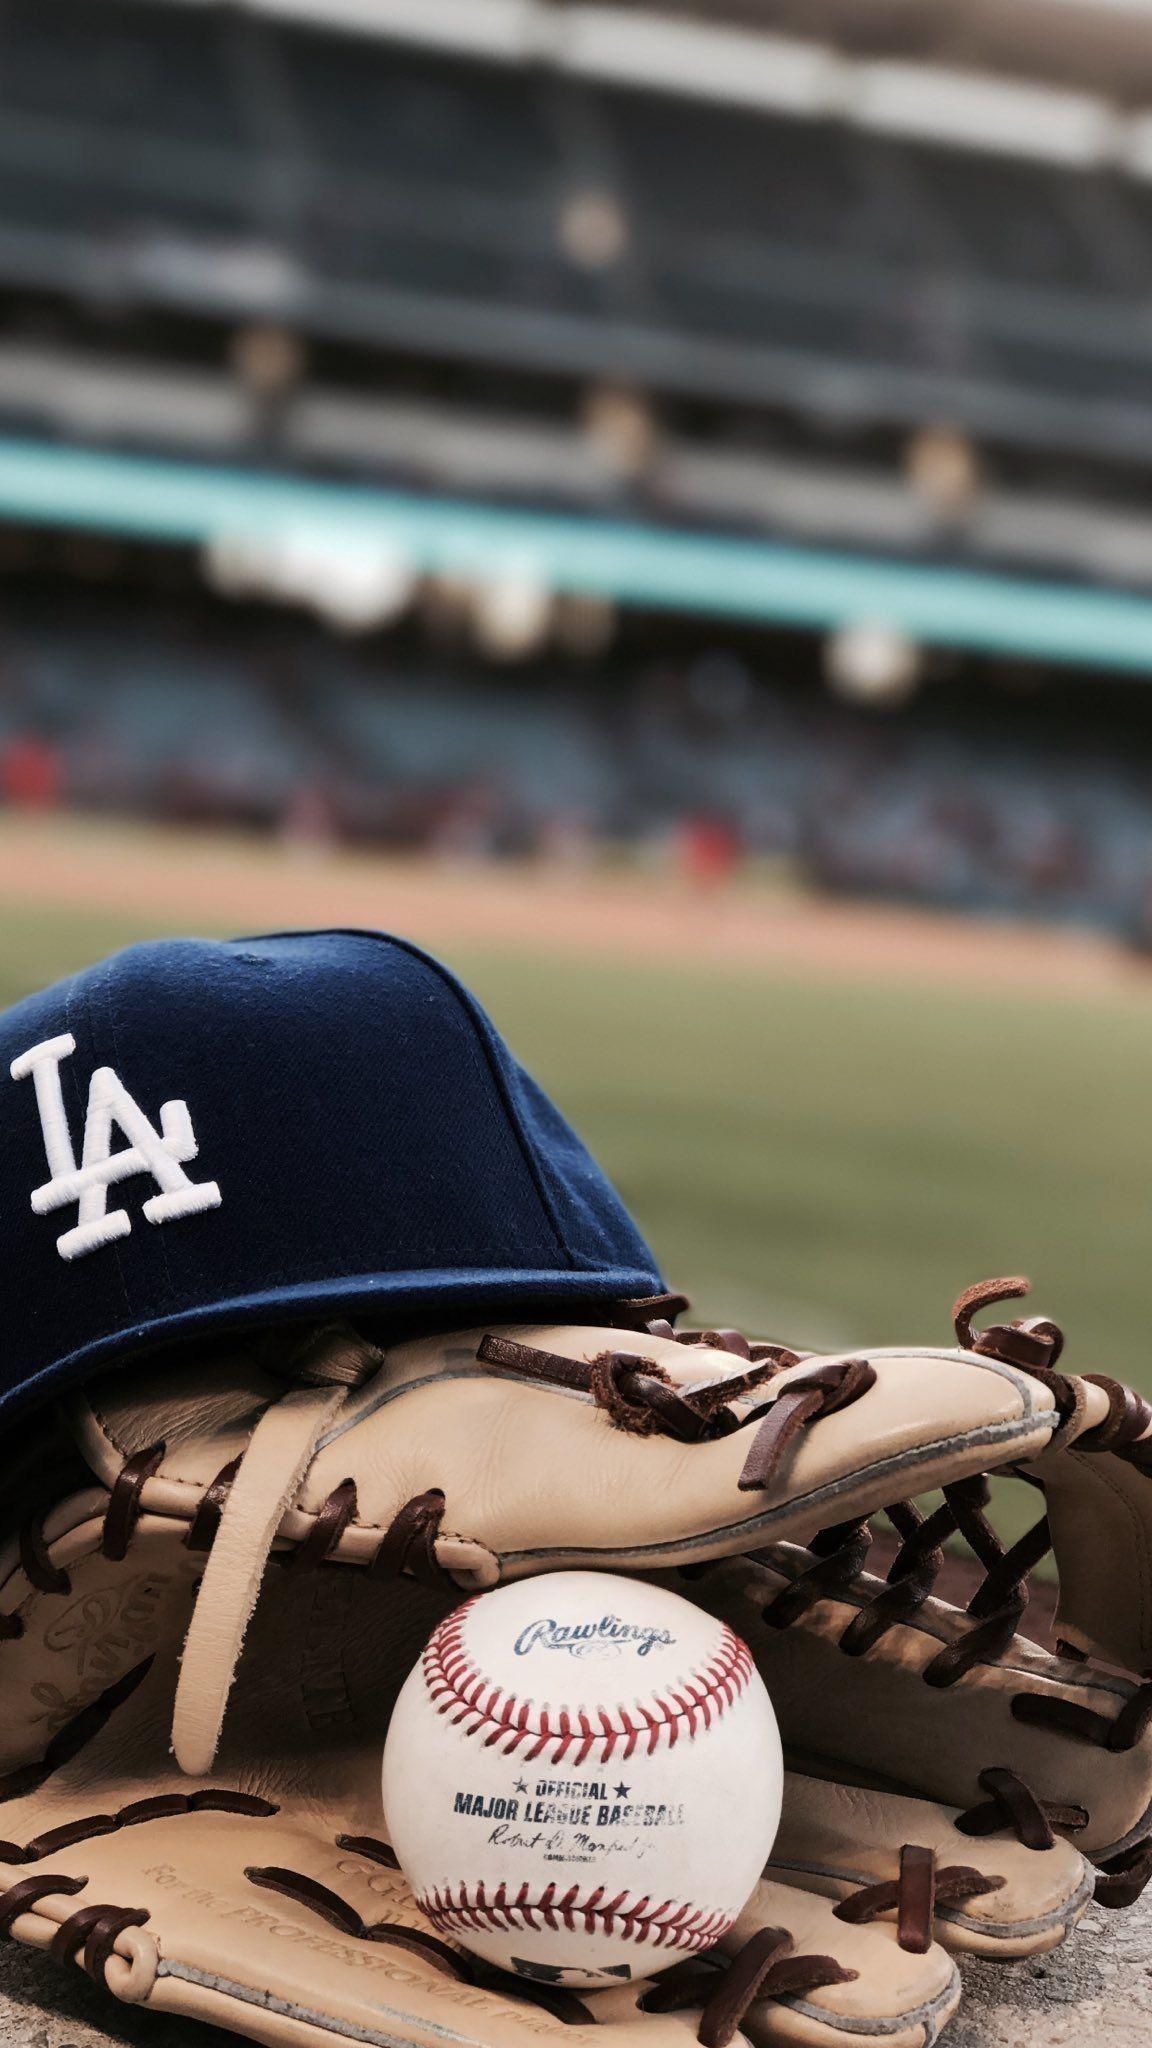 New Baseball Wallpapers for iPhone 6 Dodgers baseball